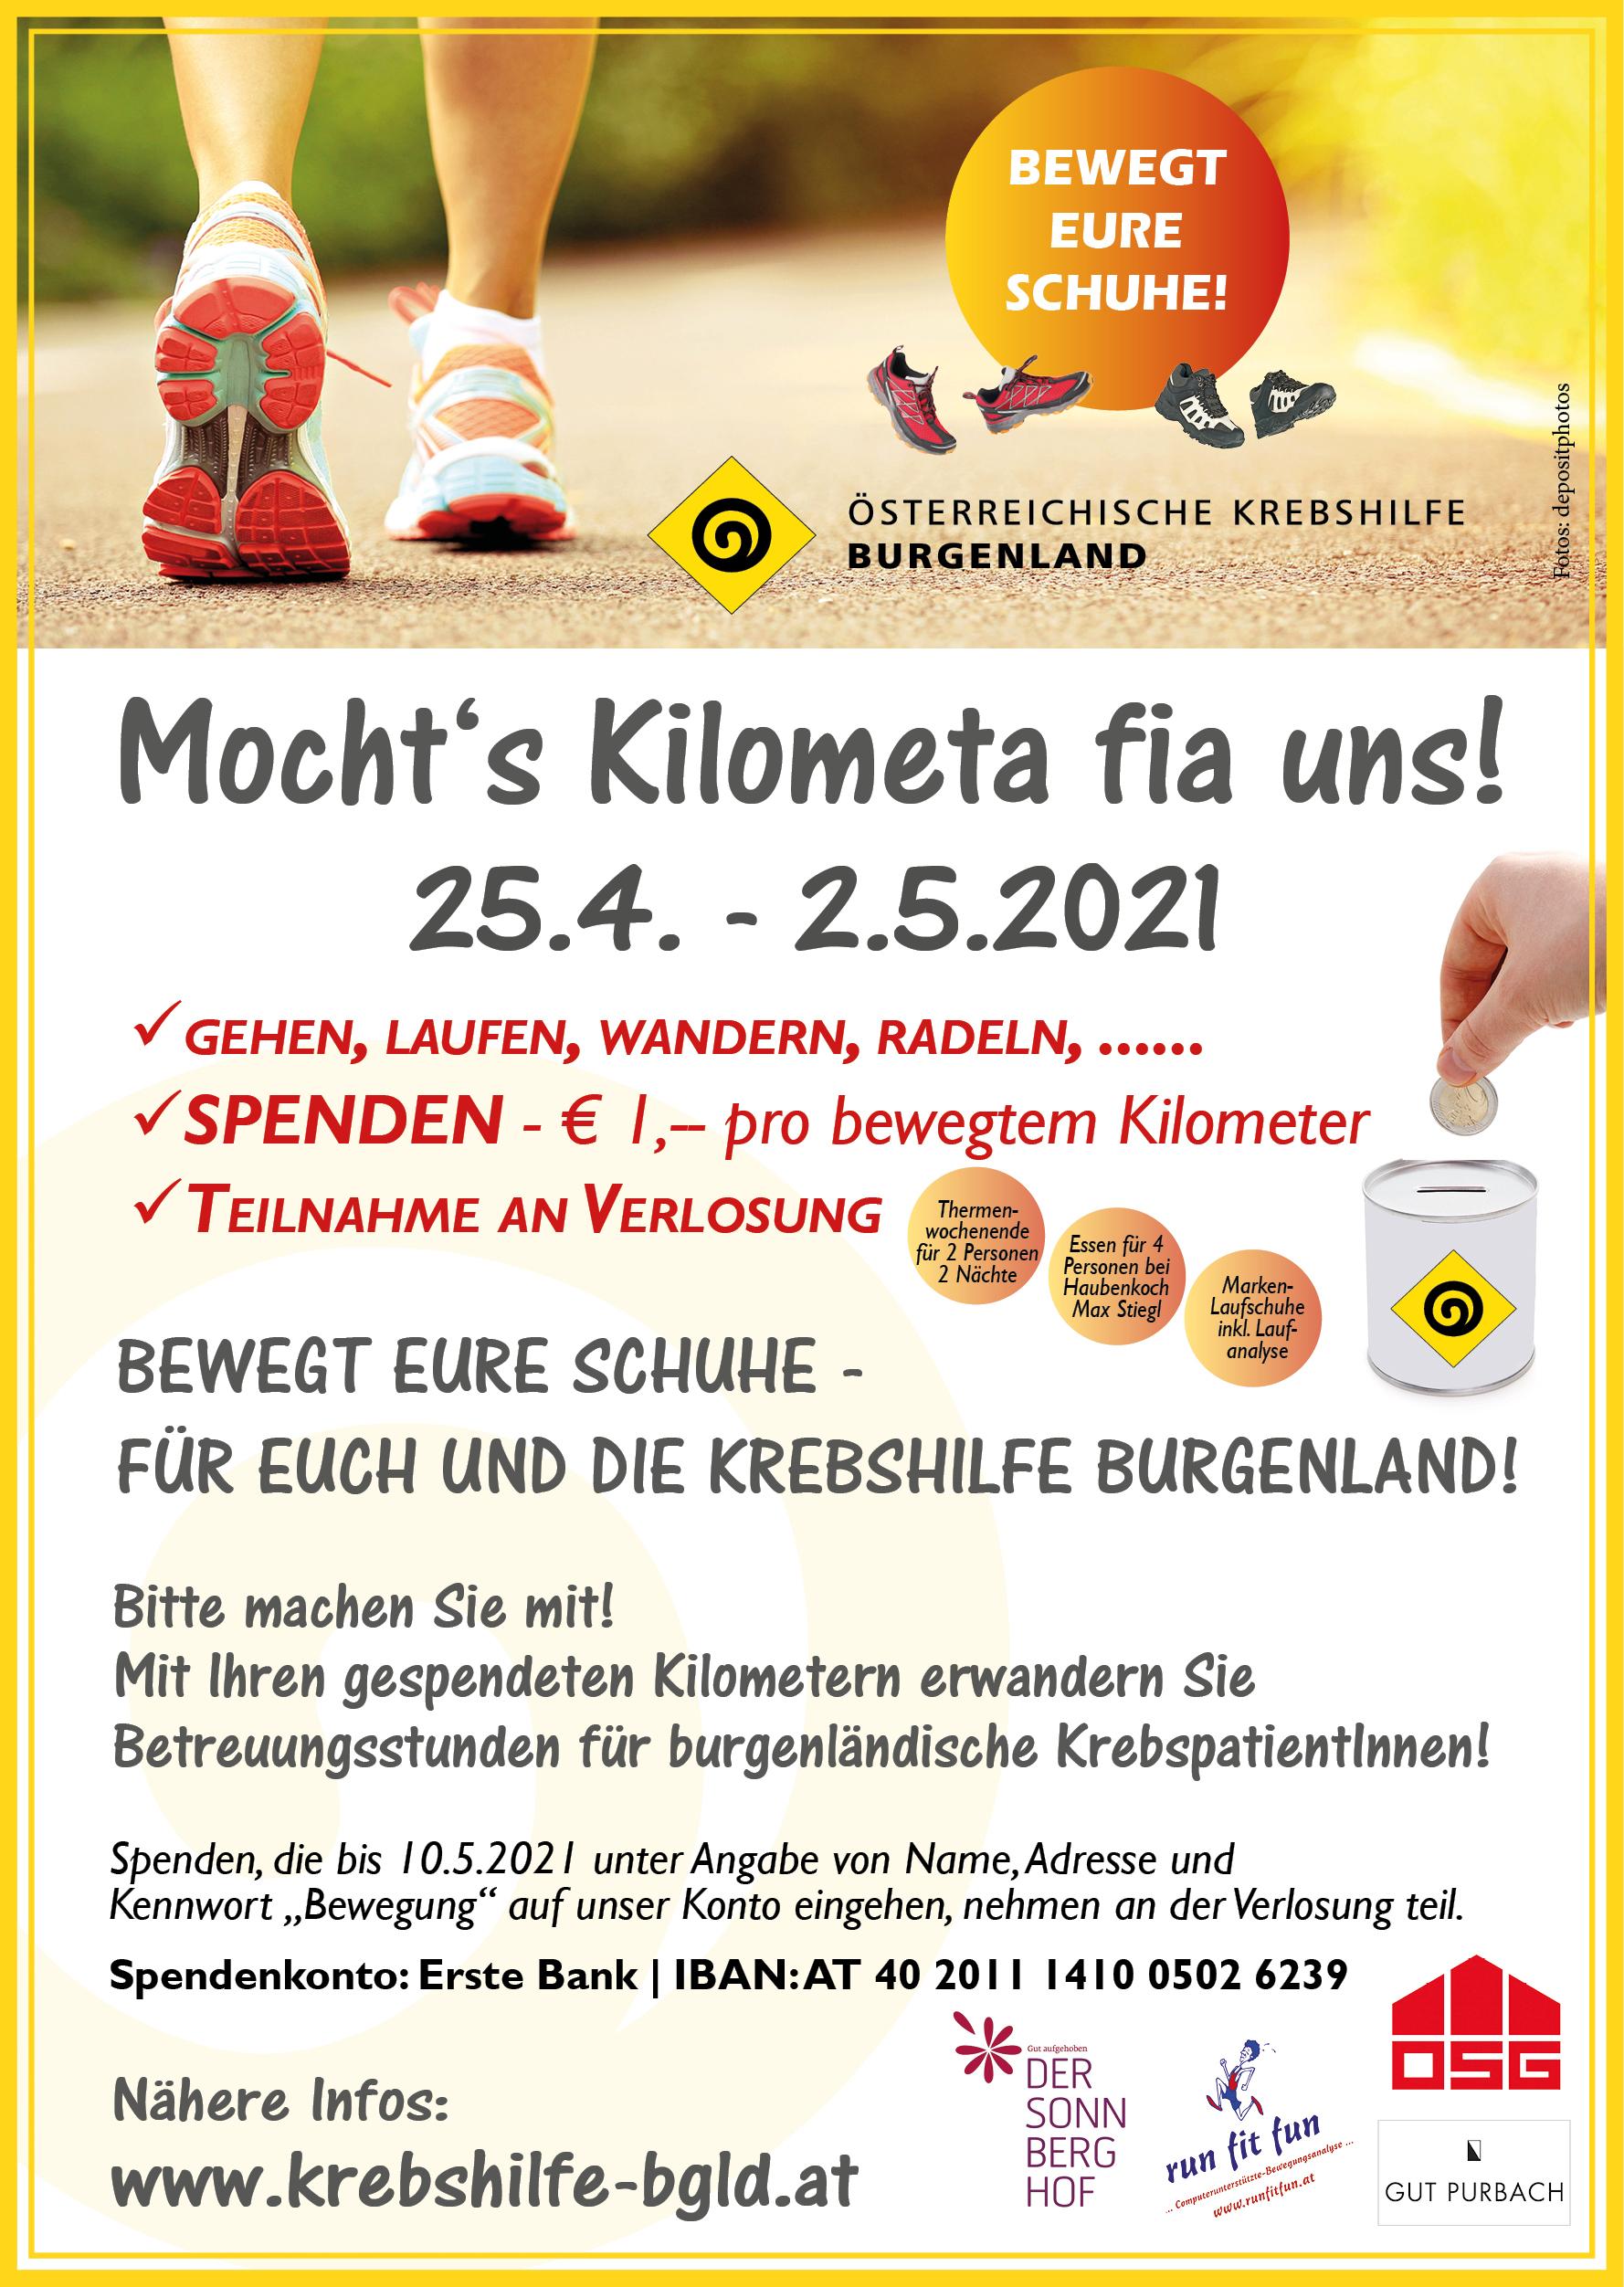 Krebshilfe Burgenland: Mochts Kilometa fia uns!